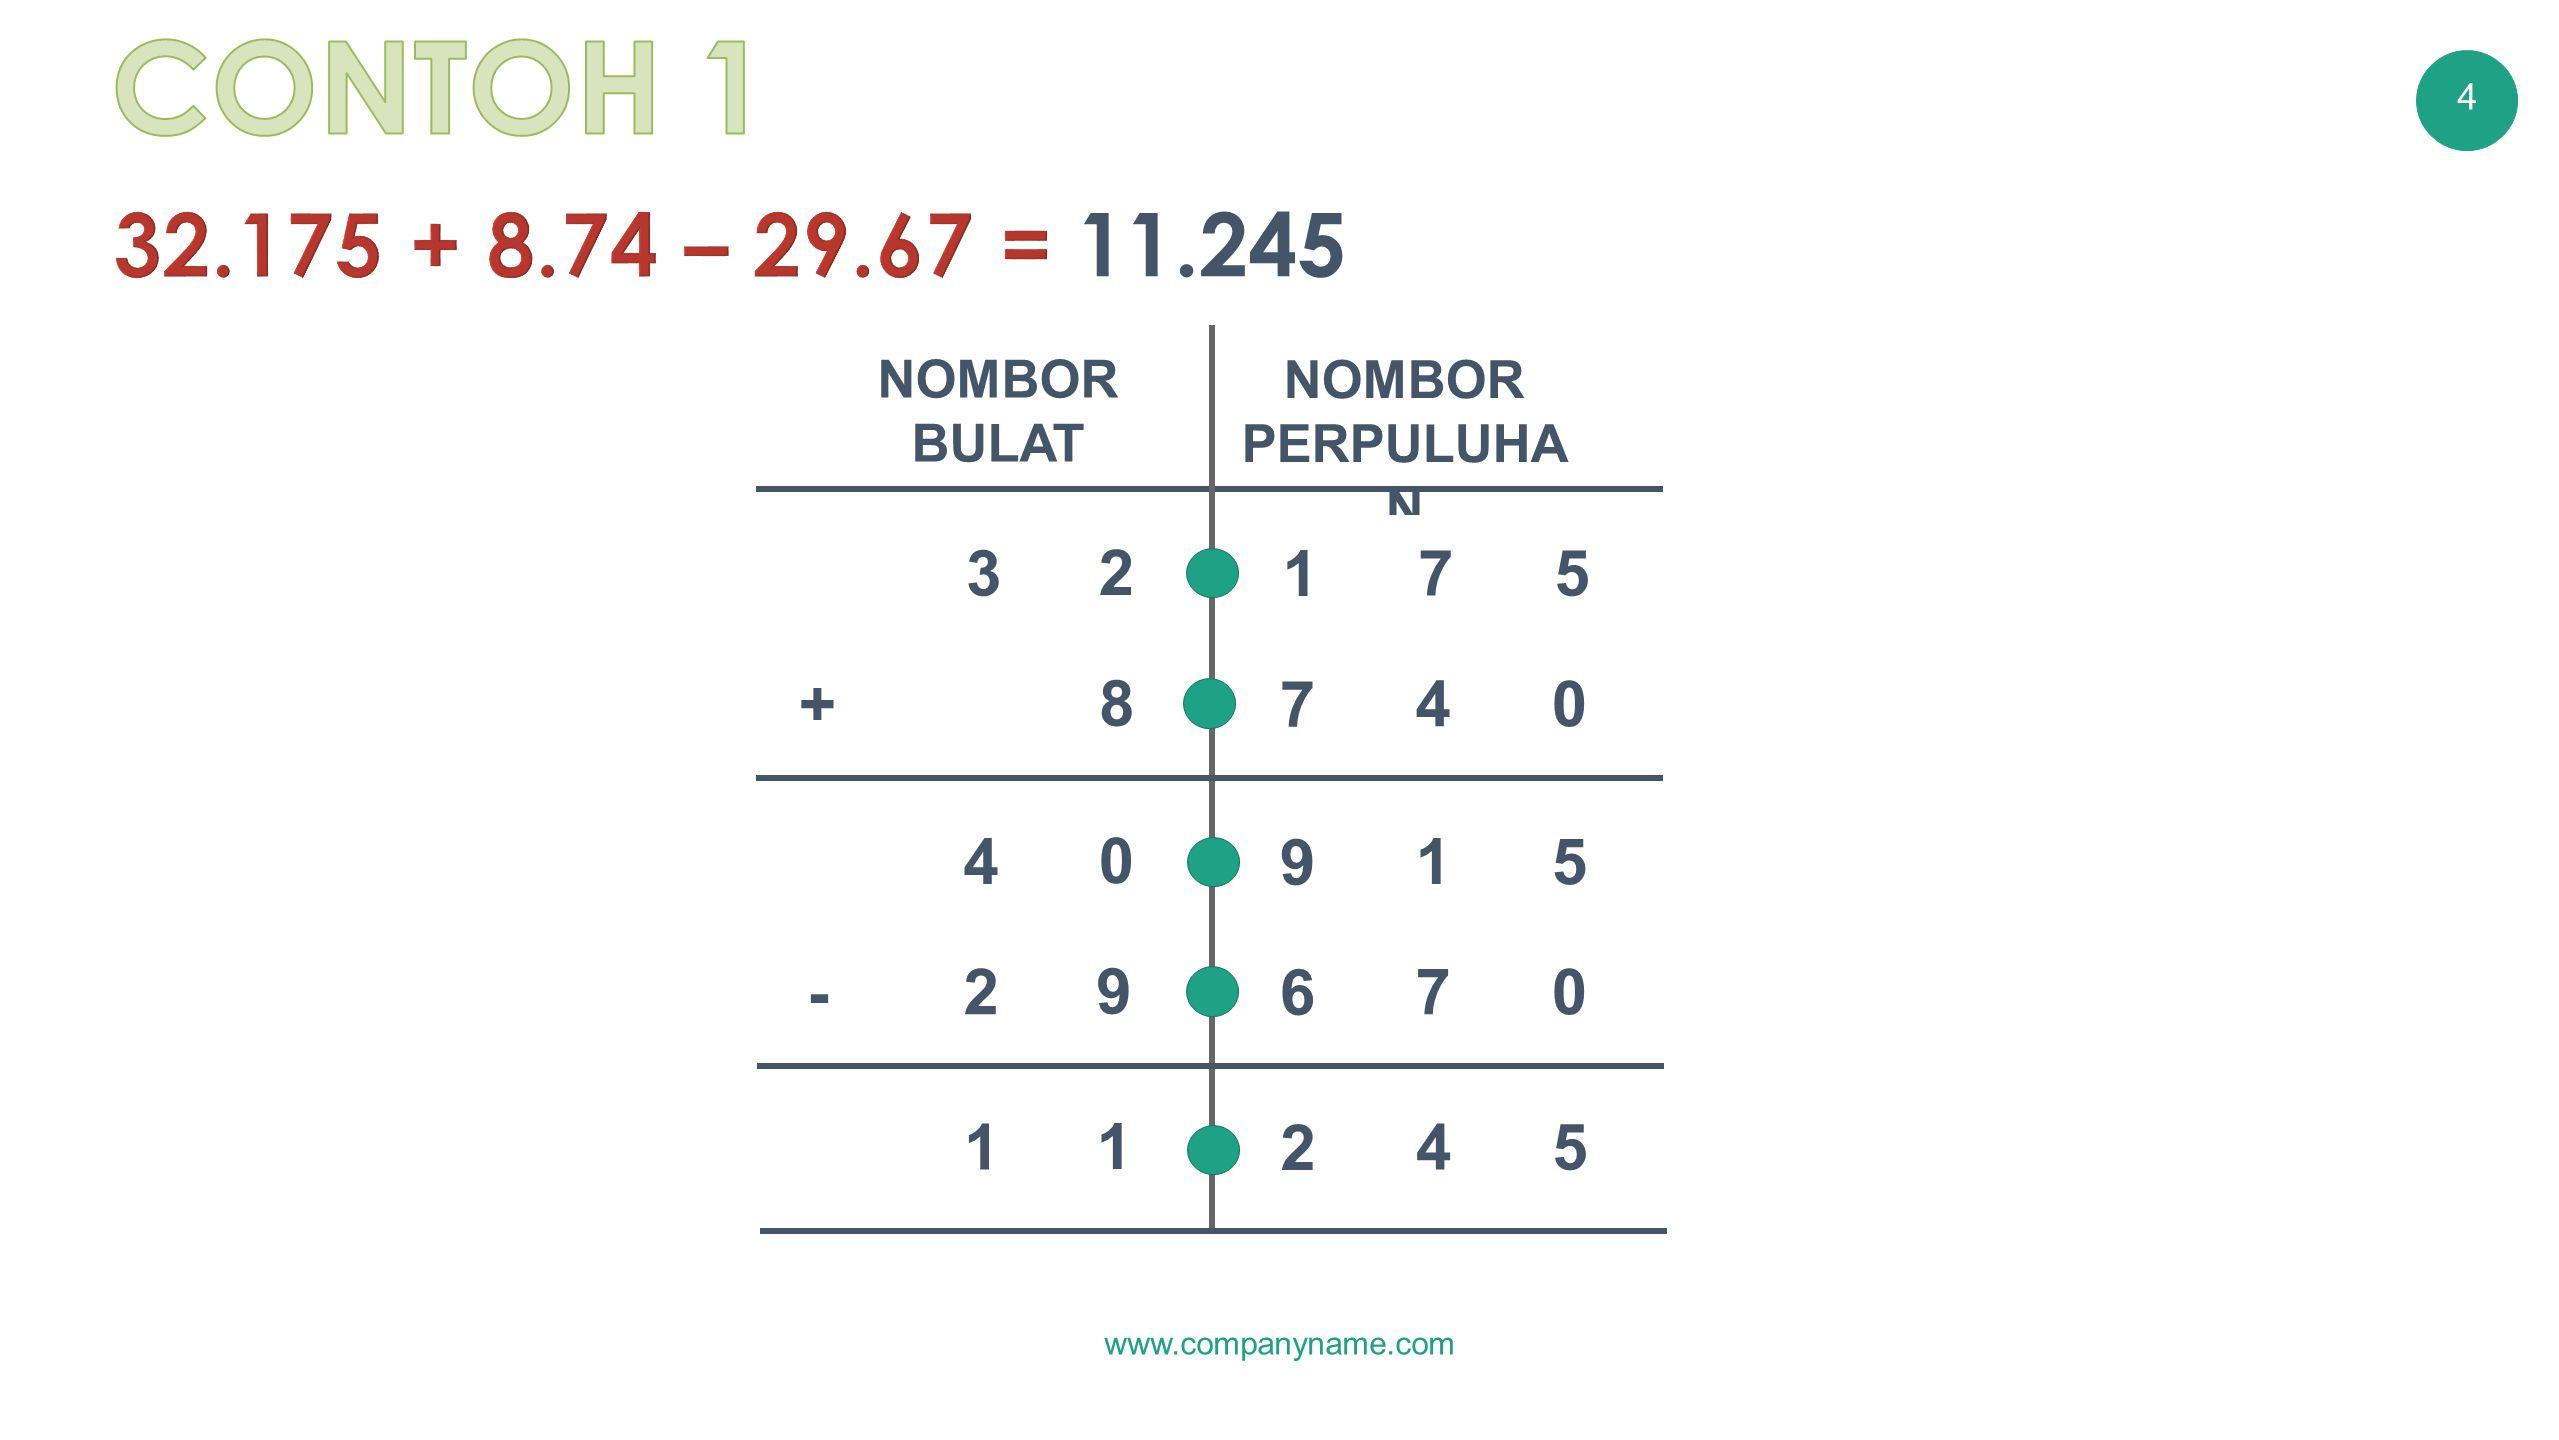 1 Bidang Nombor Bulat Tema Perpuluhan Tajuk Perpuluhan Matematik Tahun Ppt Download